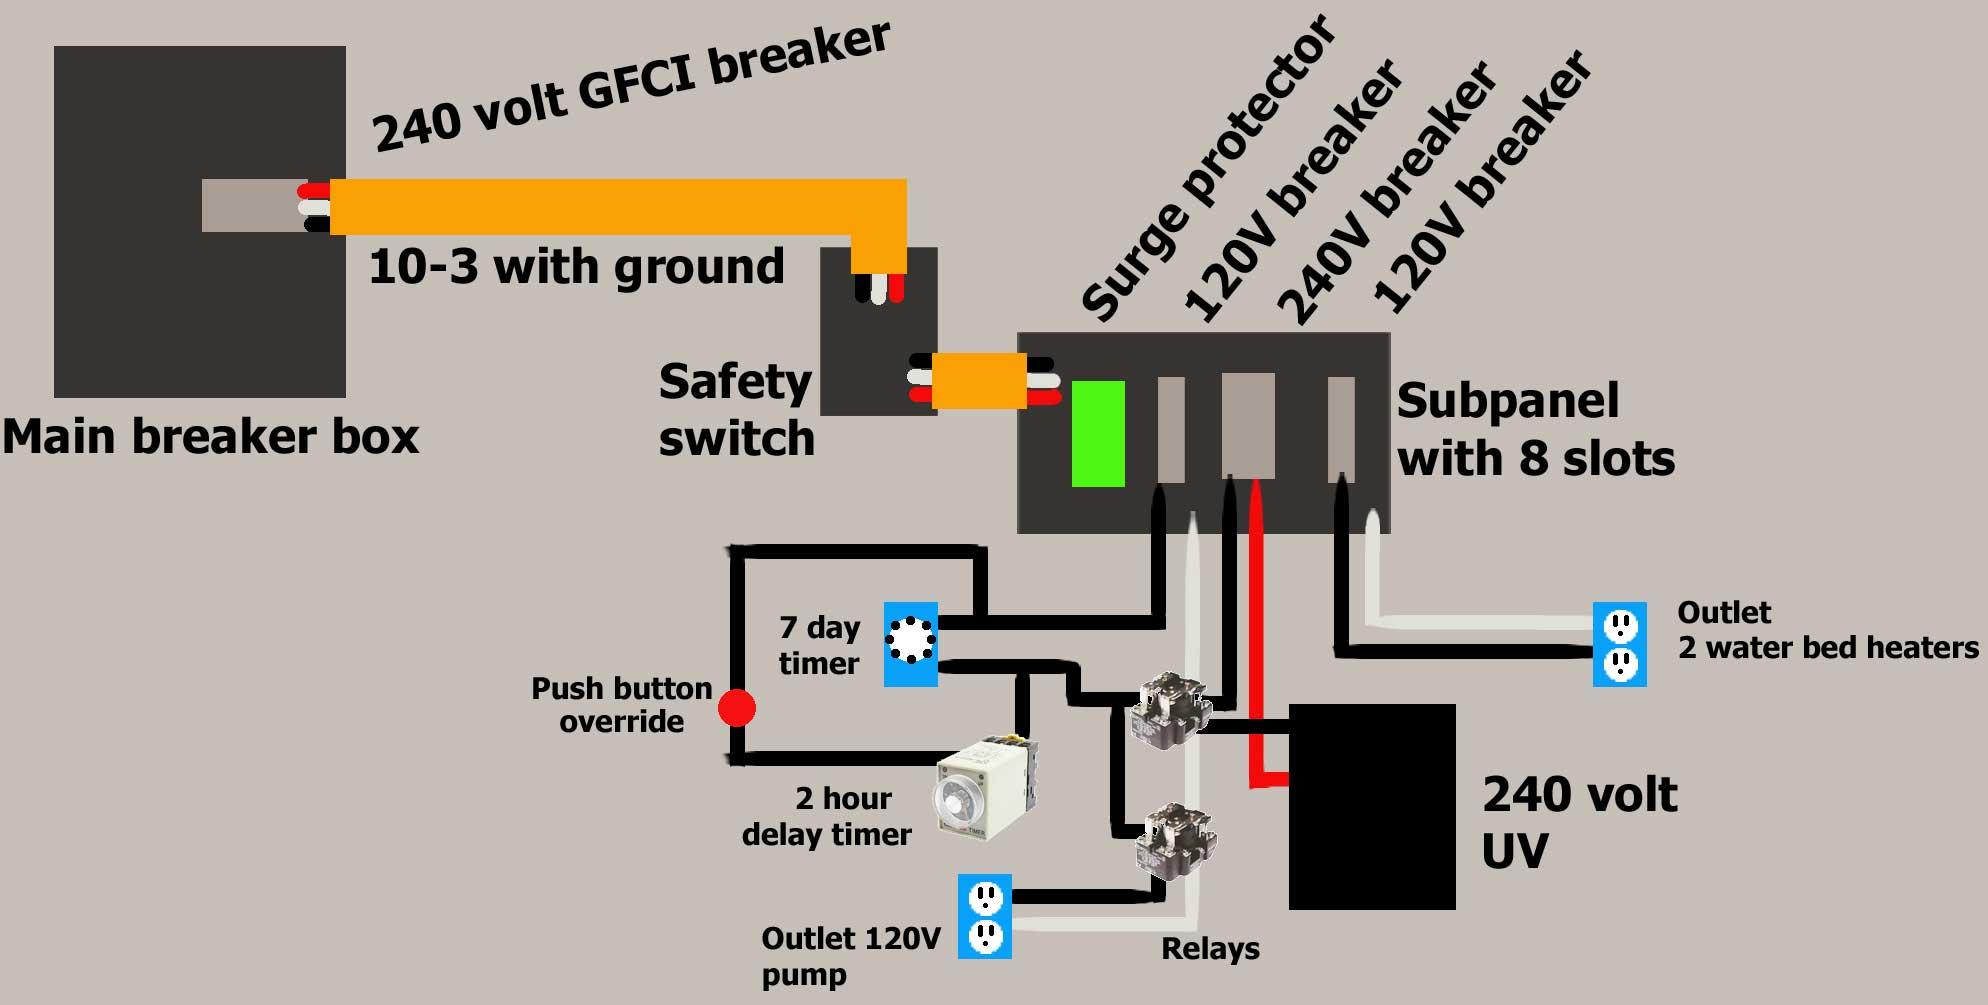 hight resolution of sensory deprivation tank wiring sensory deprivation wiring plan sensory deprivation tank wiring omron h3cr a8 wiring diagram at cita